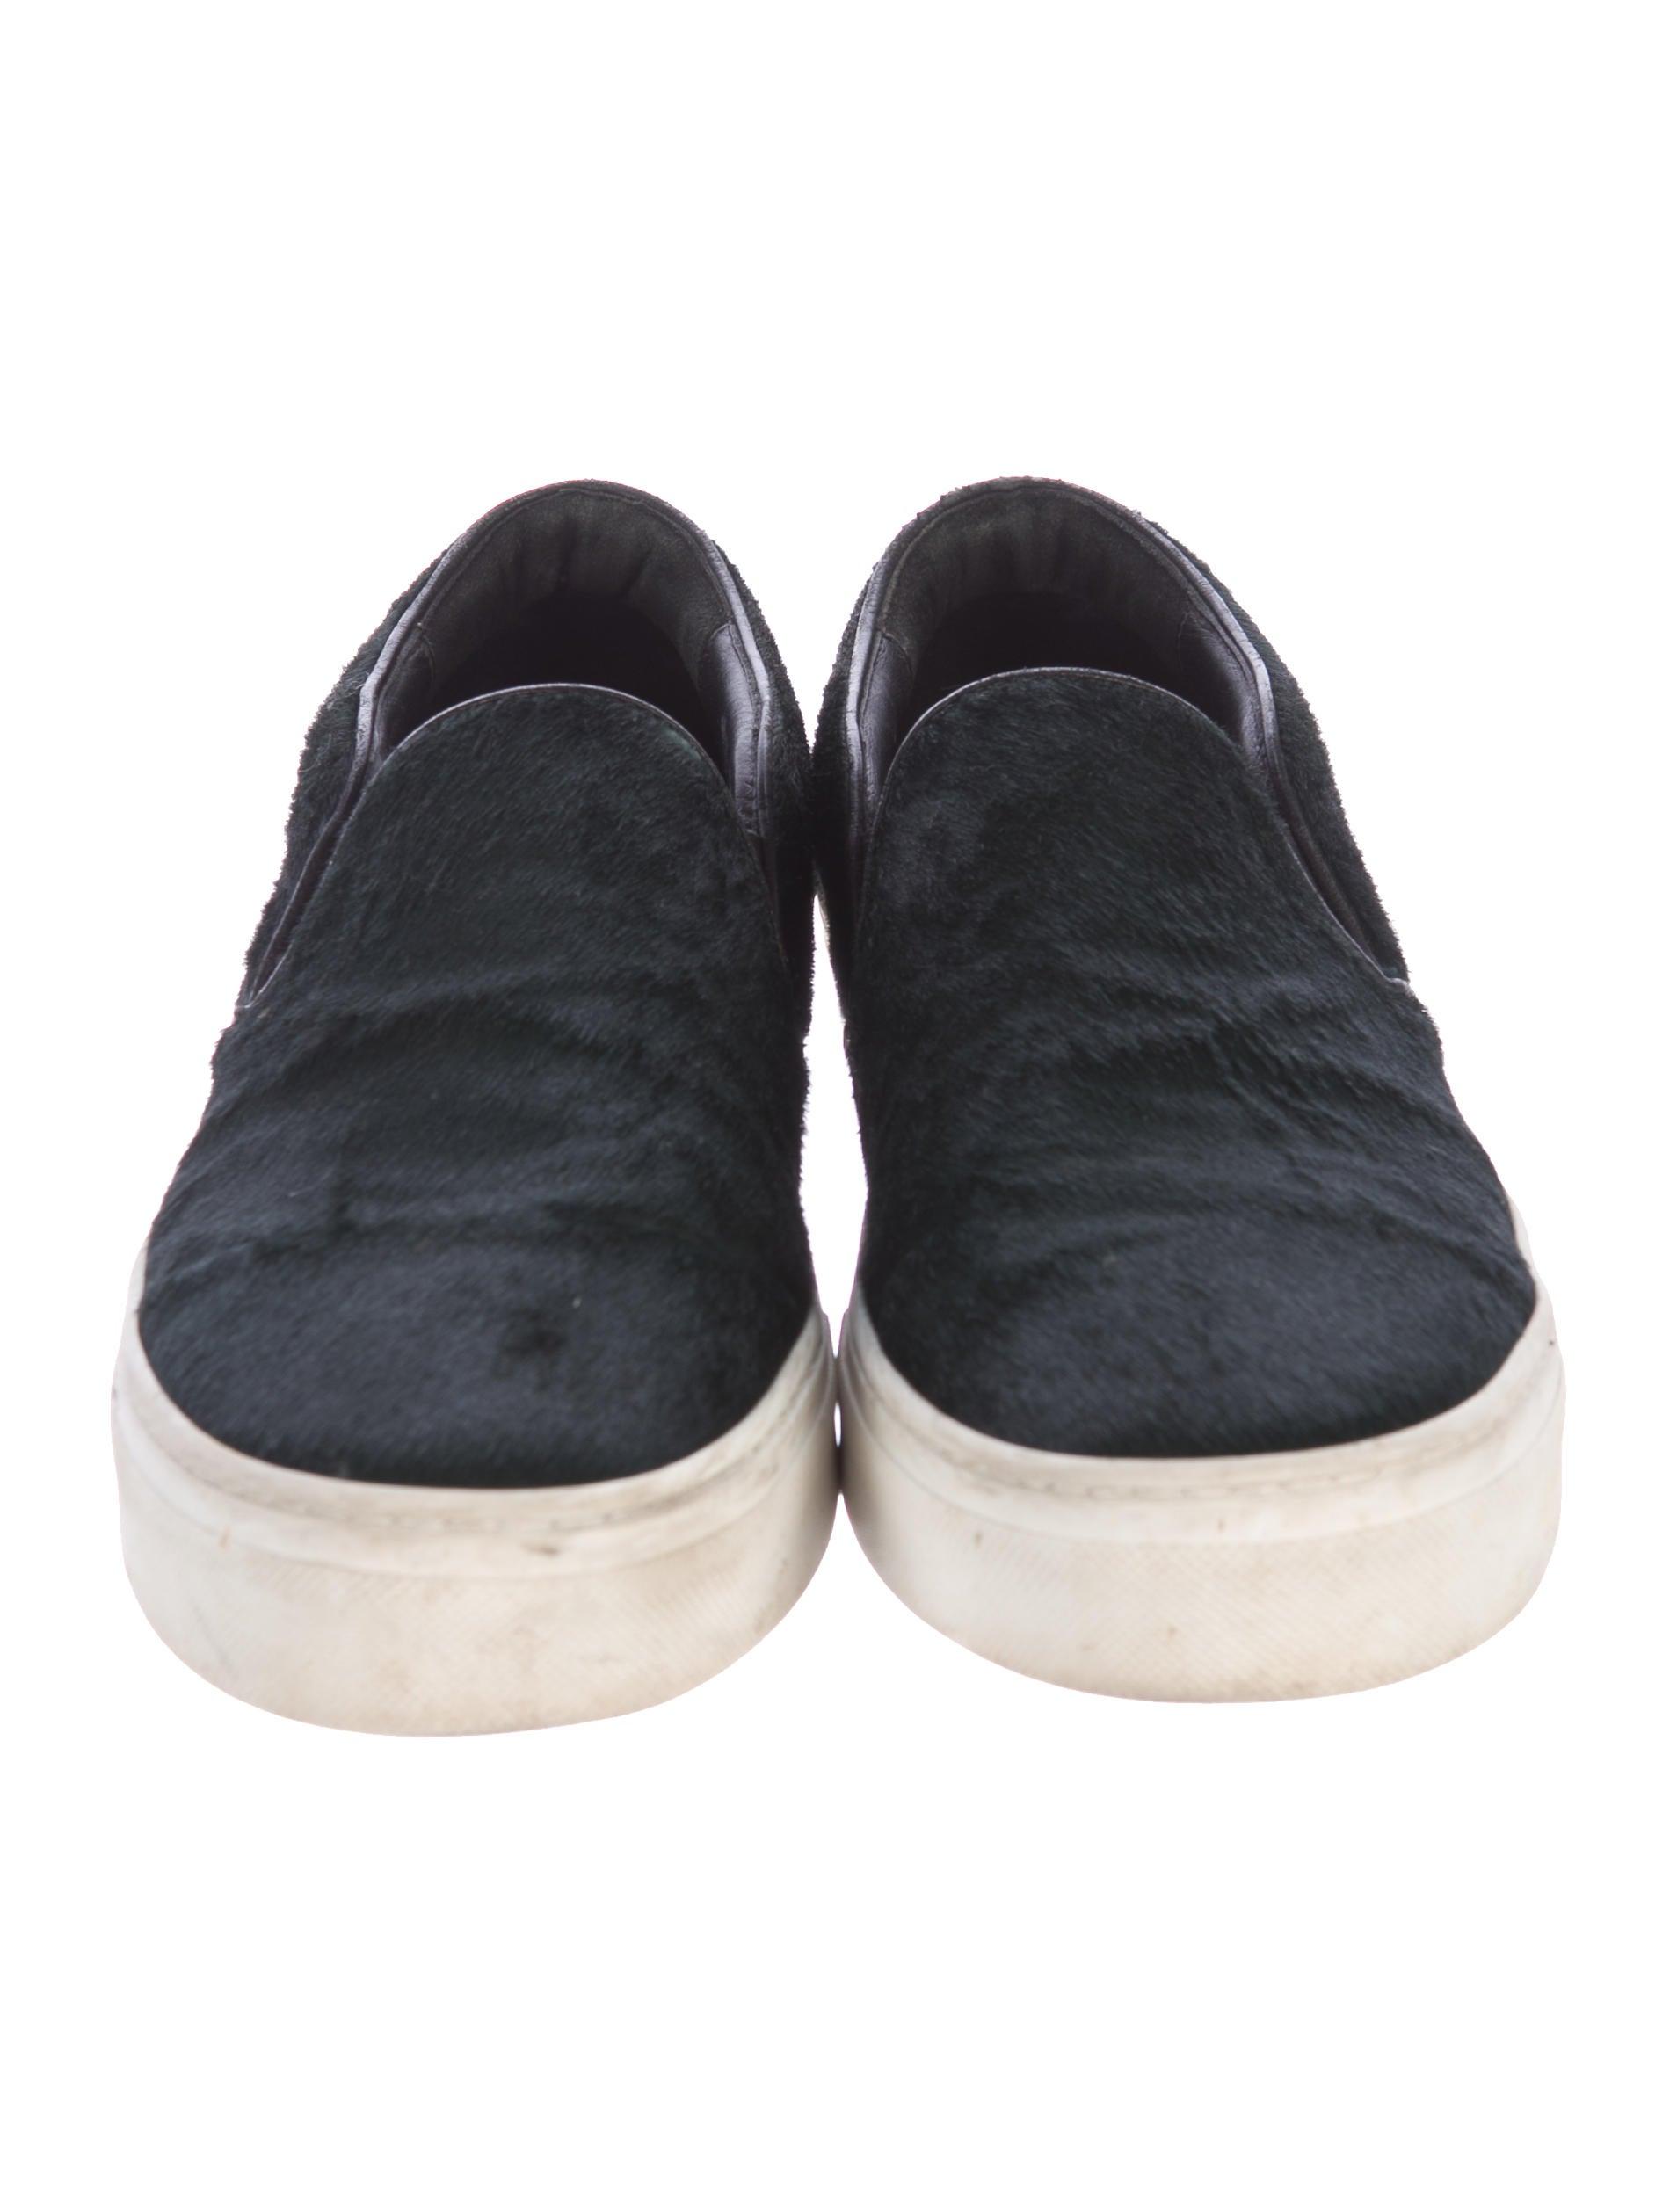 Celine Slip On Shoes Price